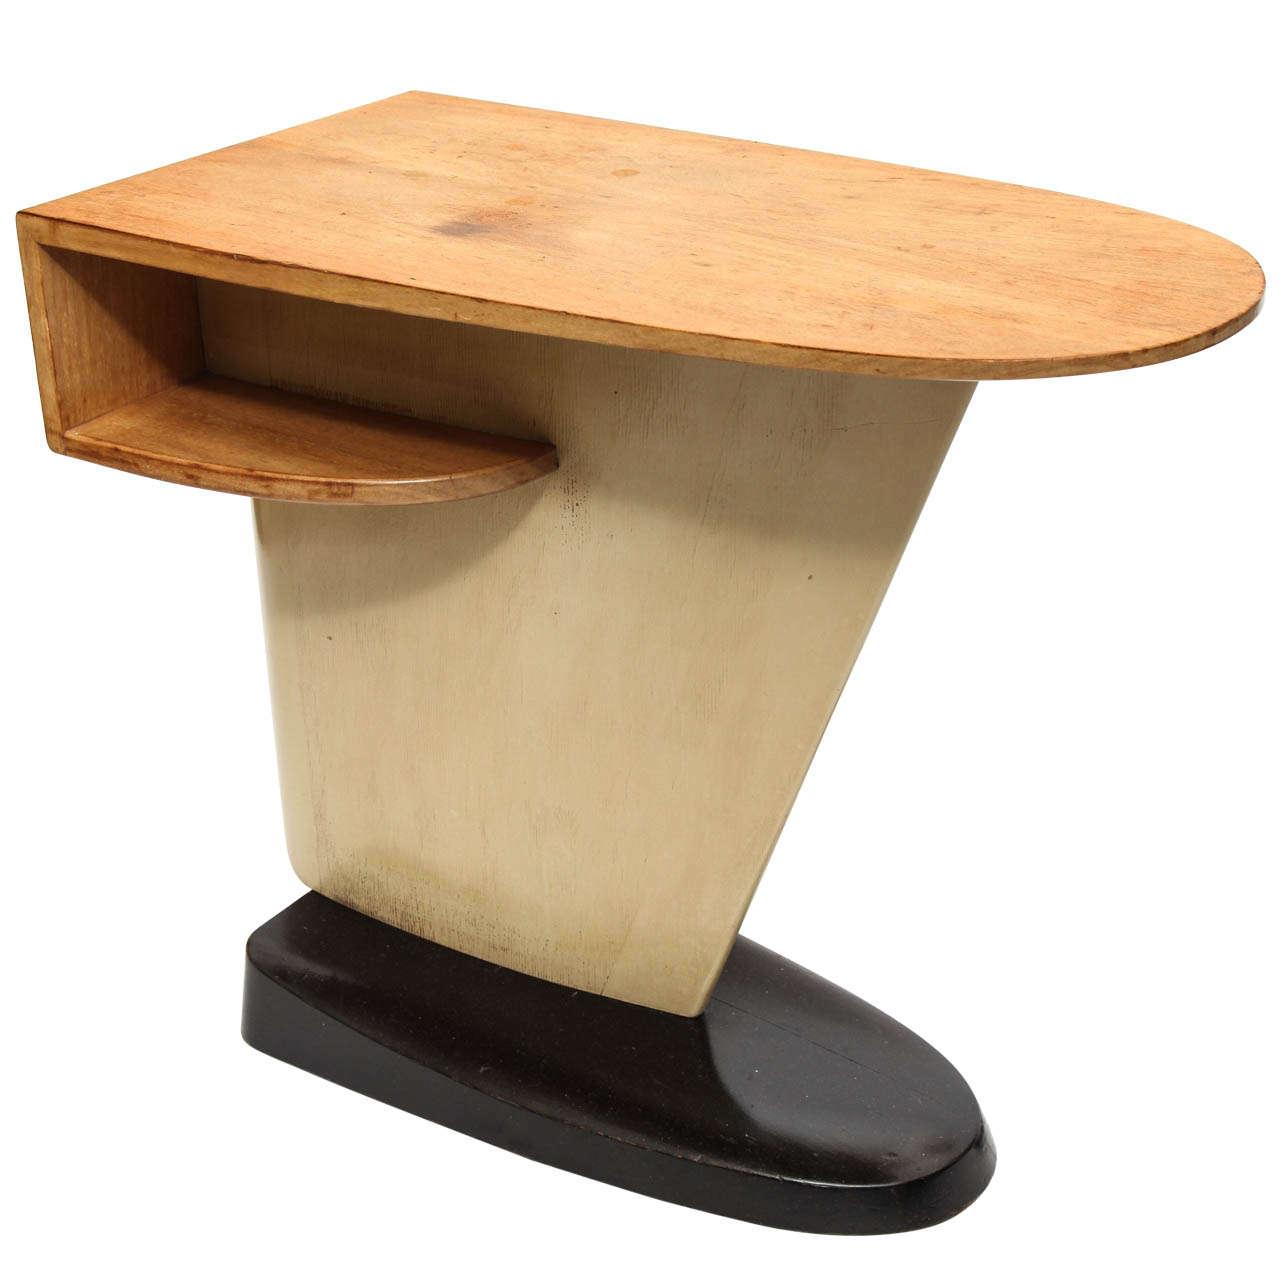 A 1930 S Streamline Table By Kem Weber Fo Mueller Furniture At 1stdibs